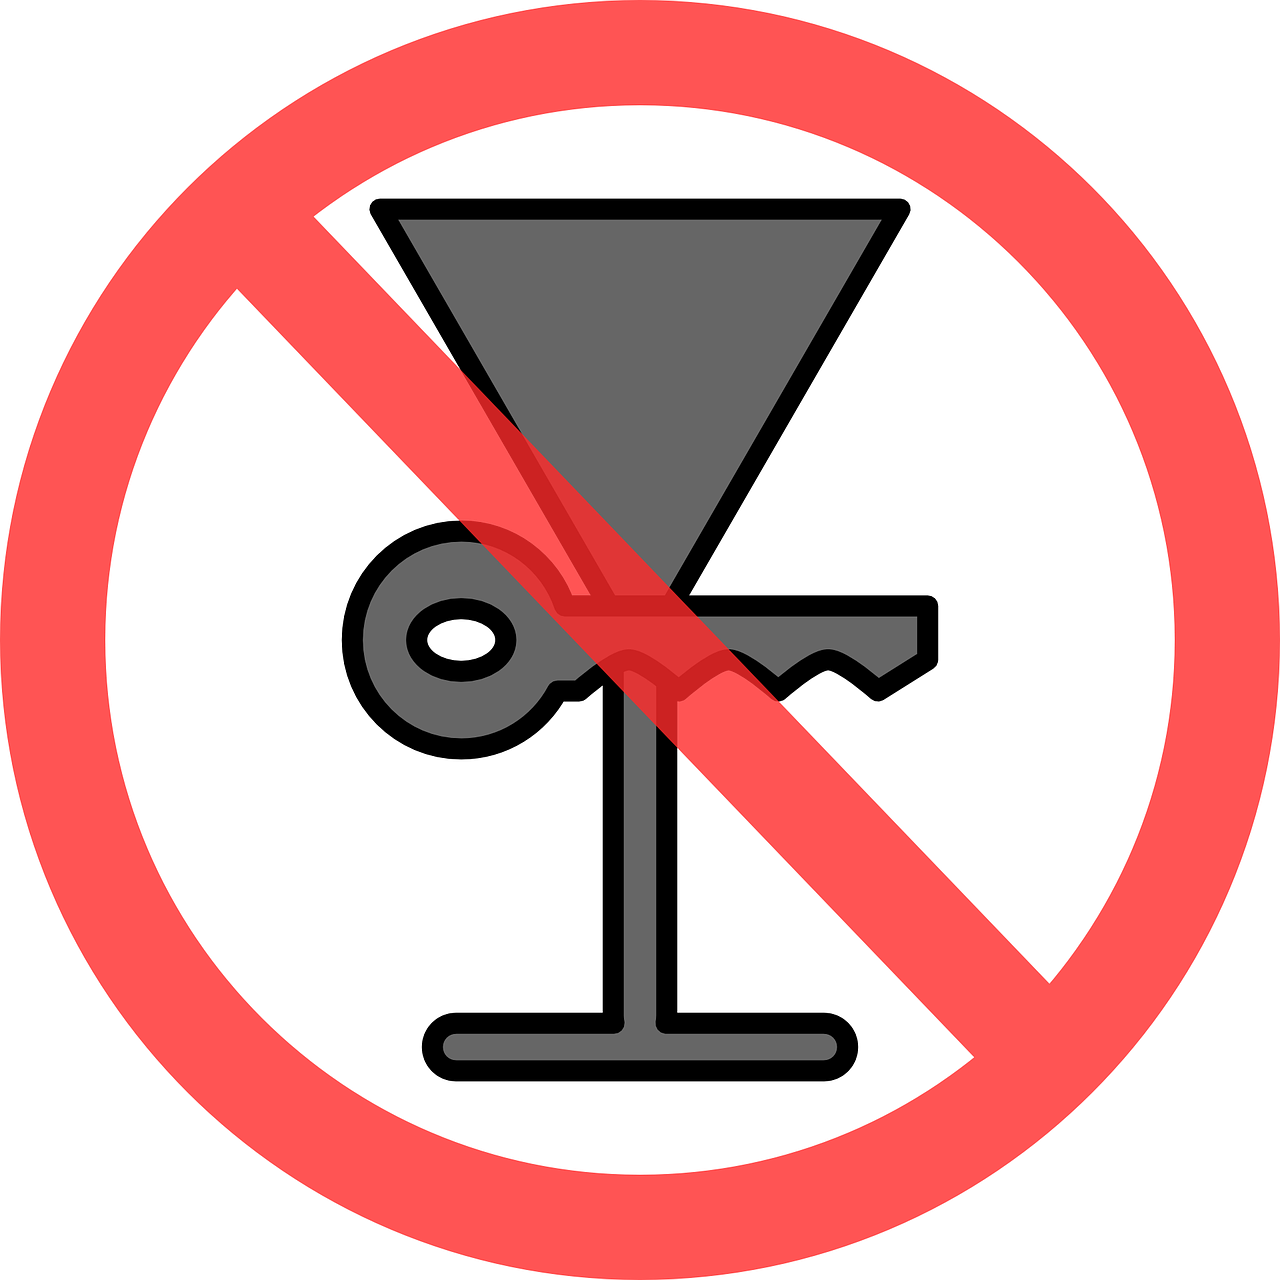 alcool voiture interdit.png